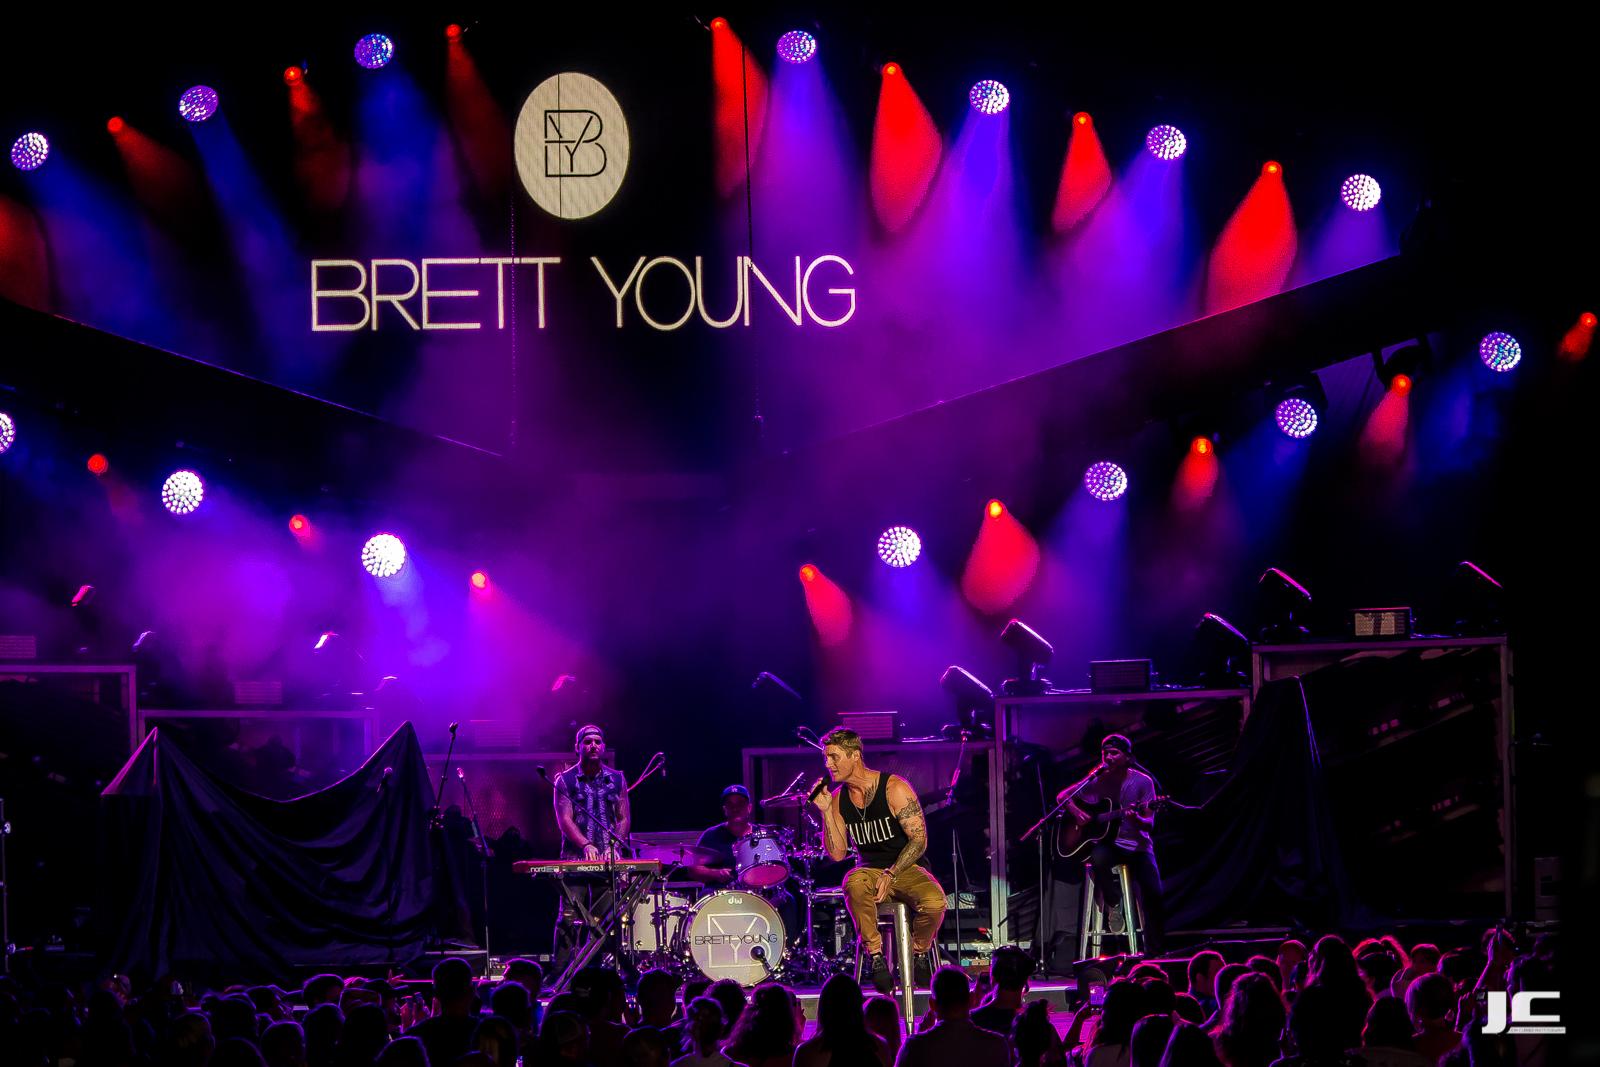 Brett Young Concert